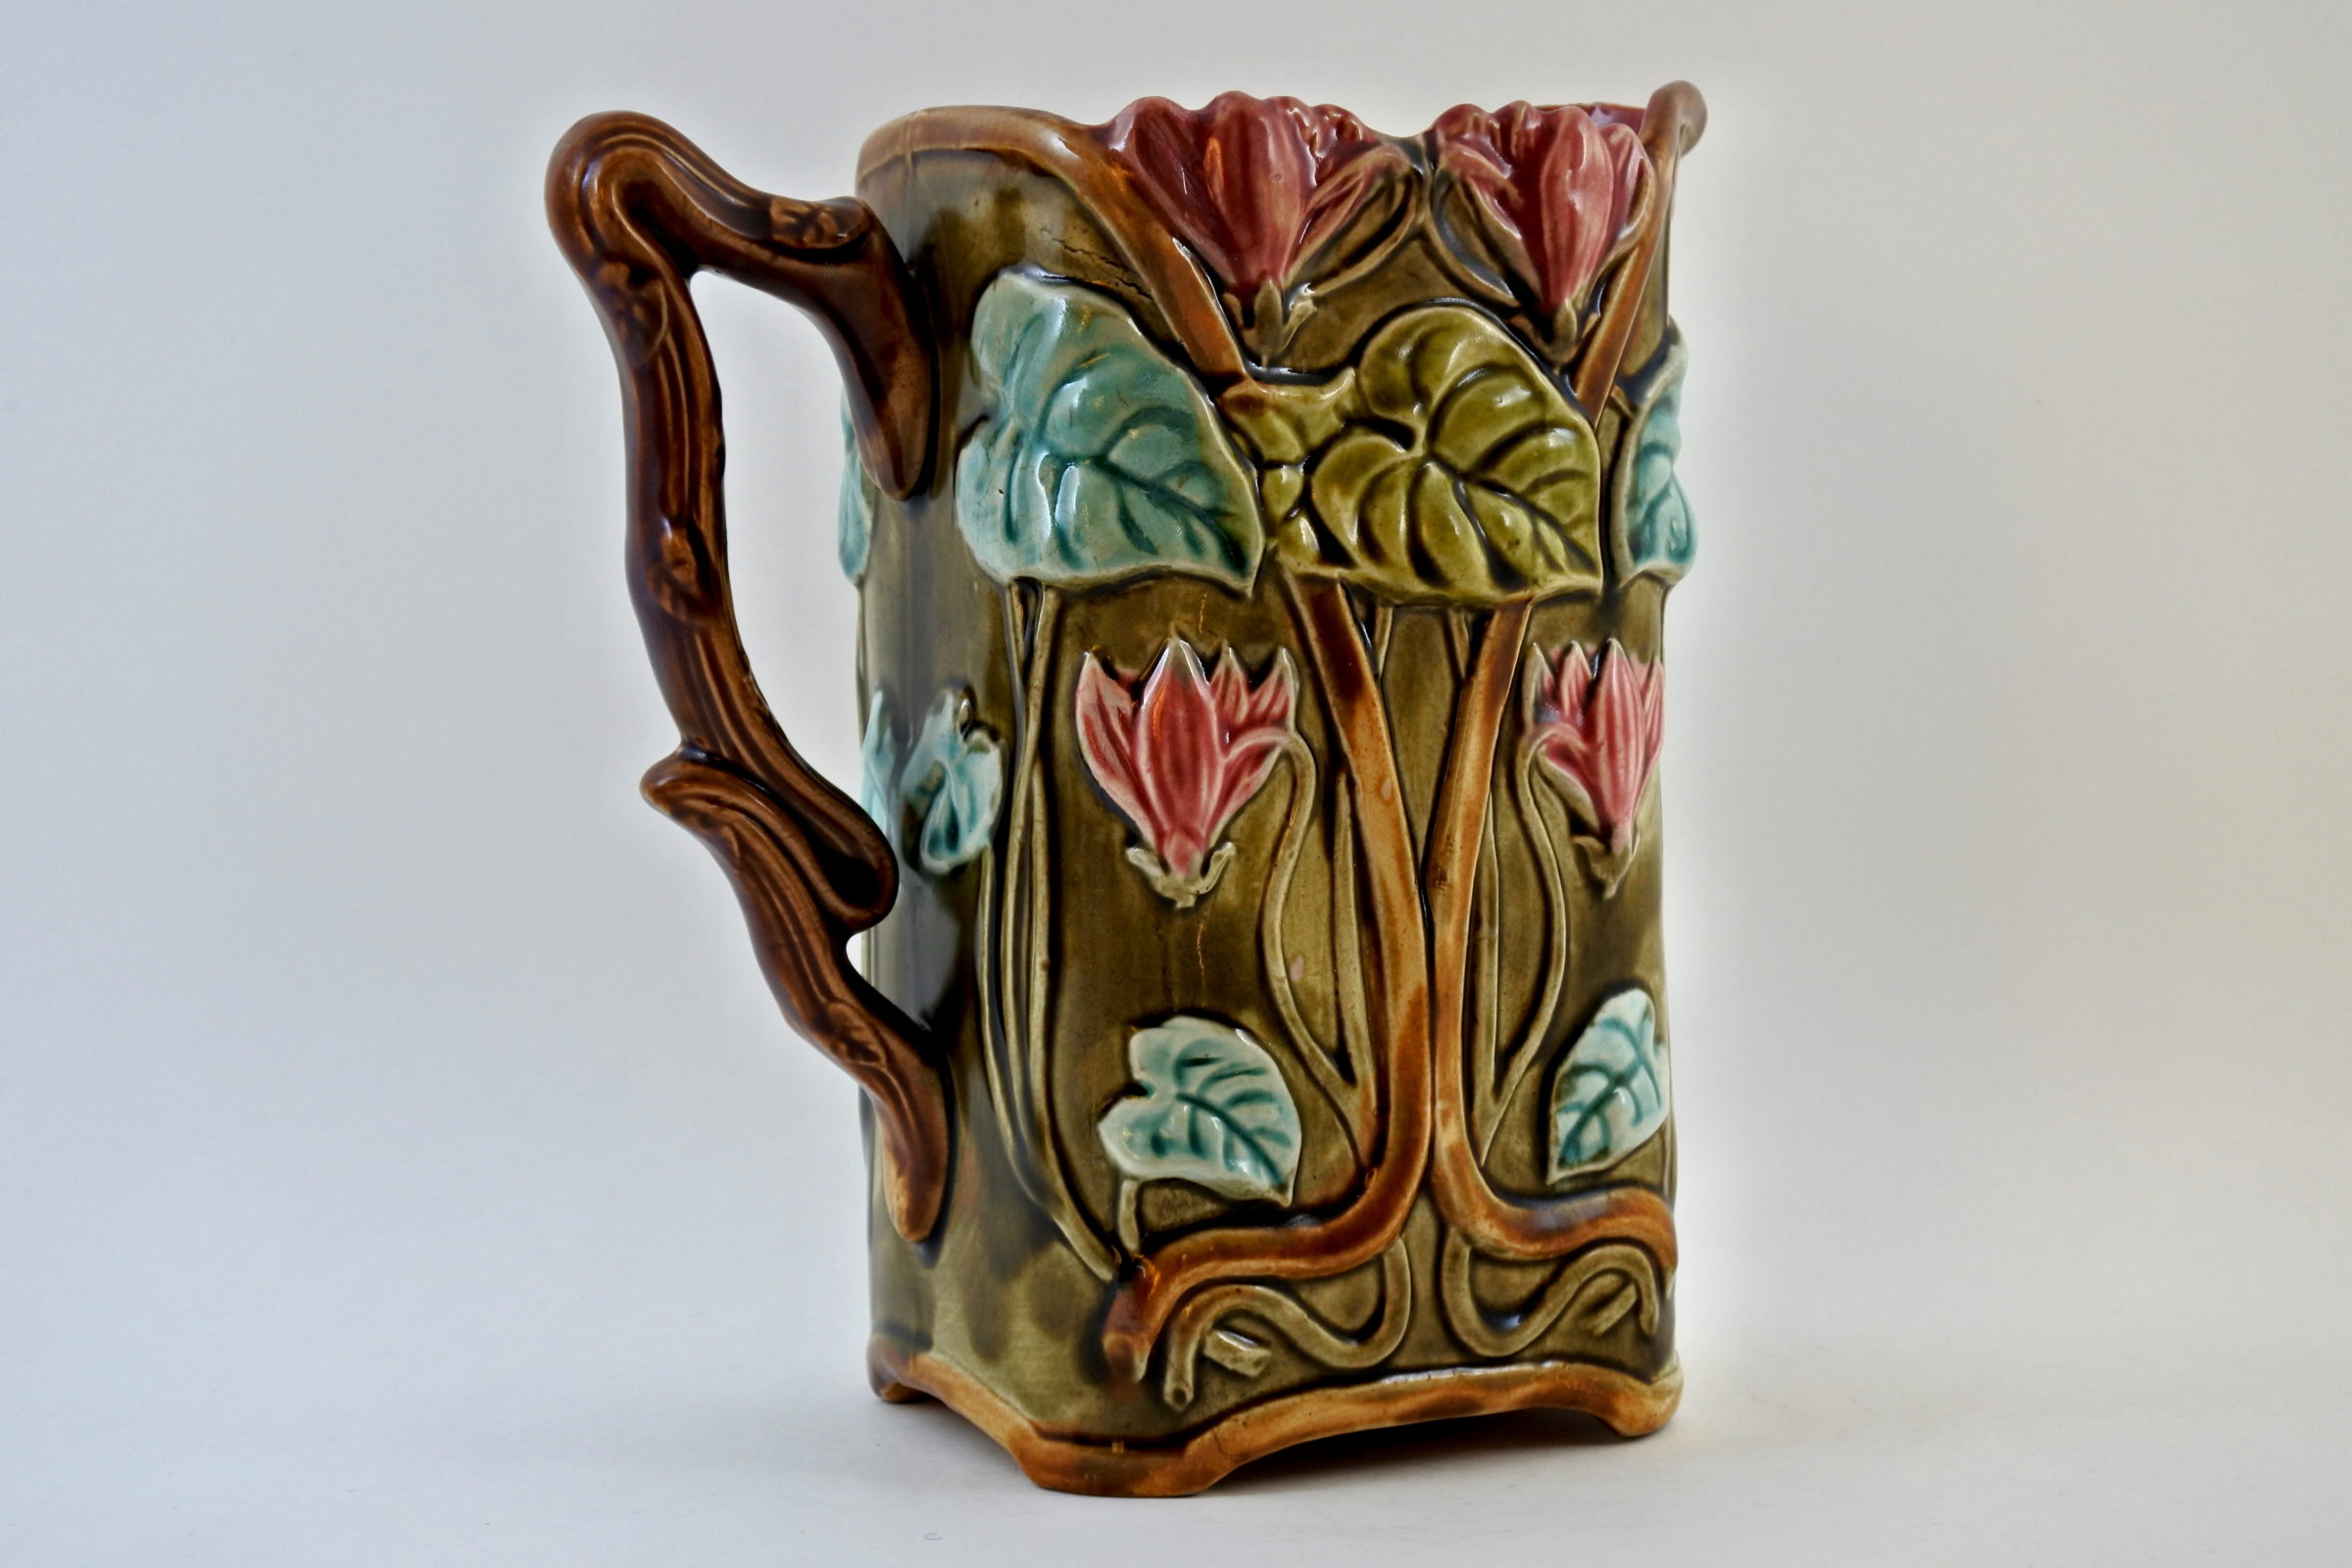 Brocca in ceramica barbotine con ciclamini - Carré cyclamen - 3